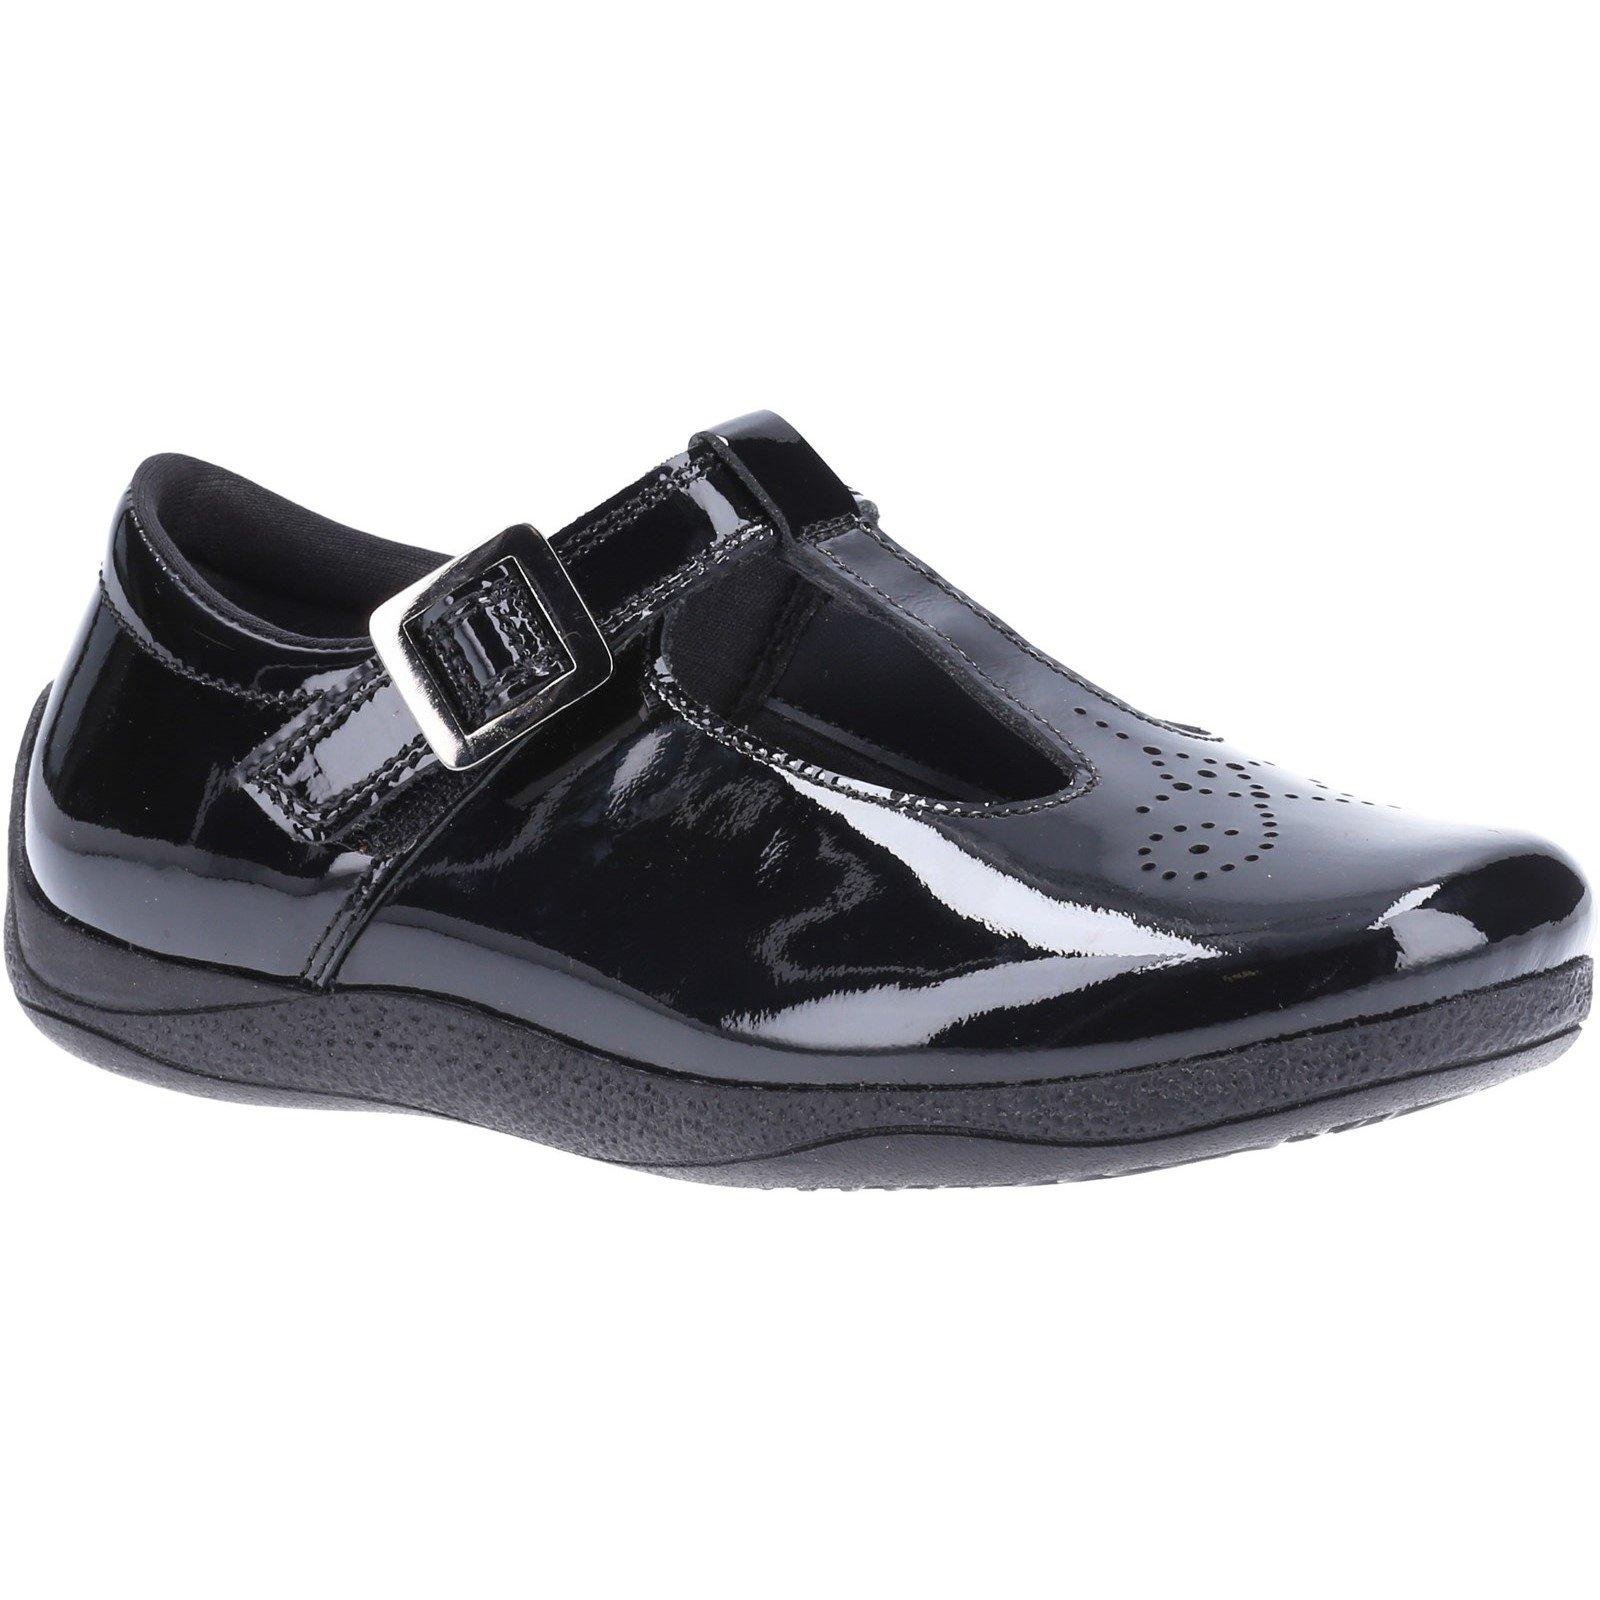 Hush Puppies Kid's Eliza Senior School Shoe Patent Black 32592 - Patent Black 4